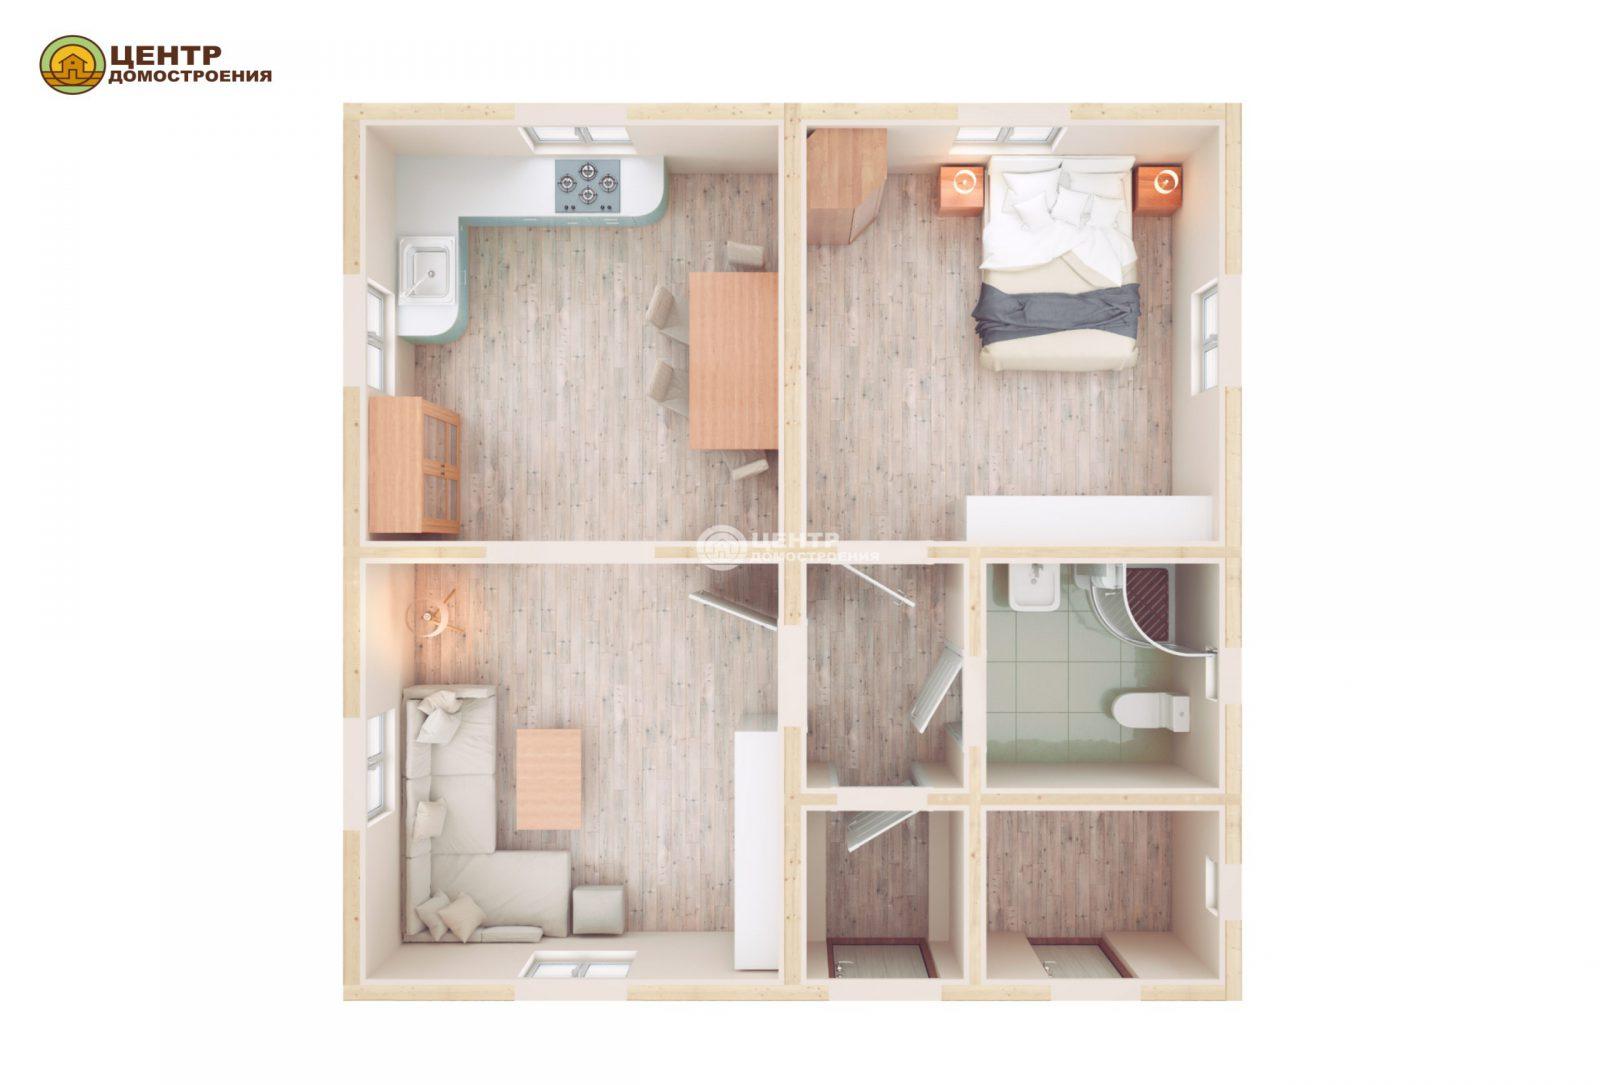 Проект одноэтажного дома 8 на 8